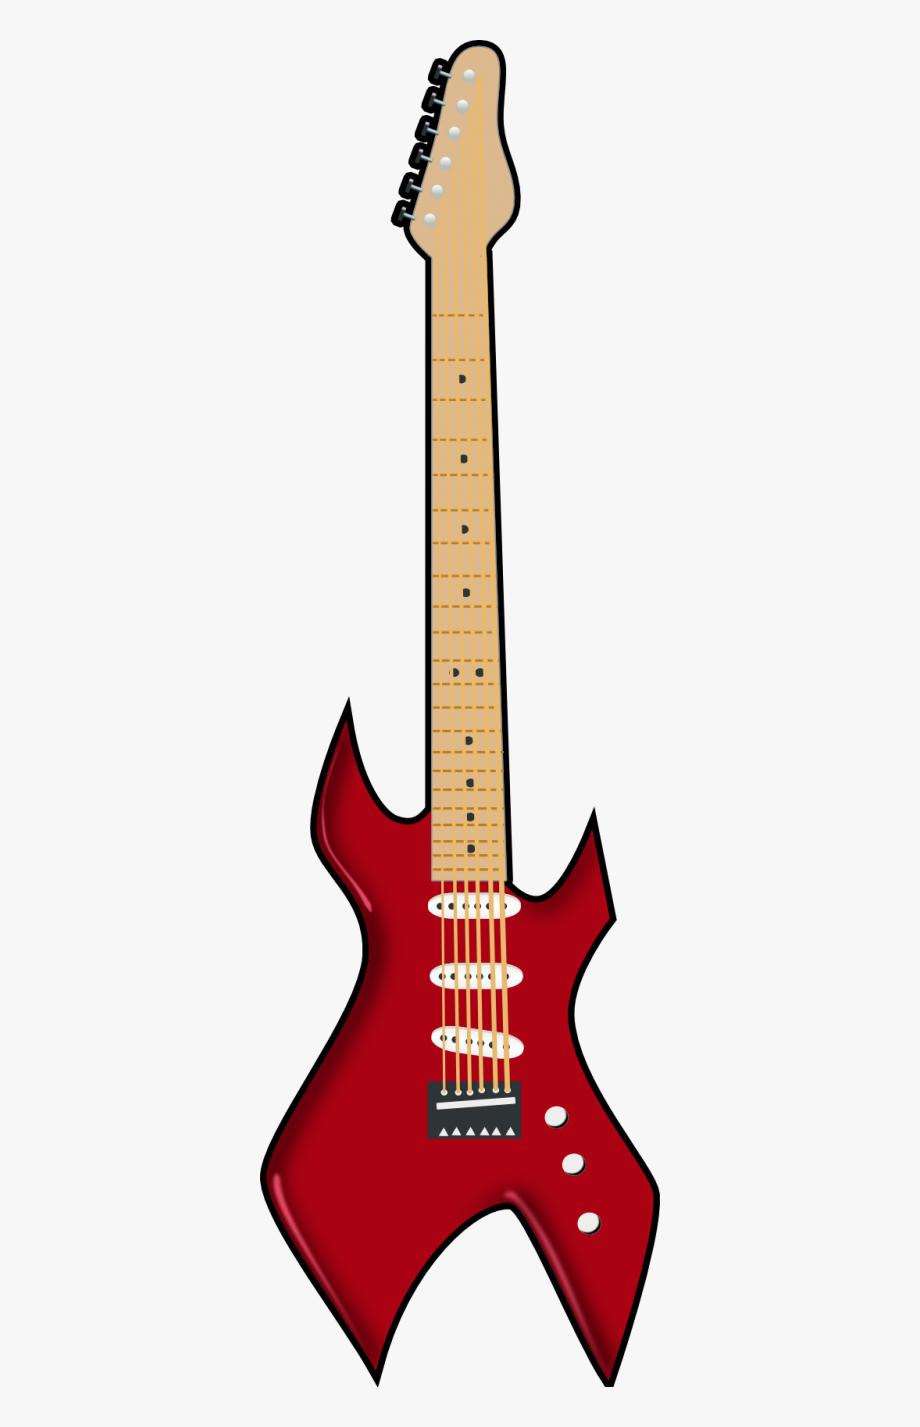 Clipart guitar 80 guitar. Electric rock png